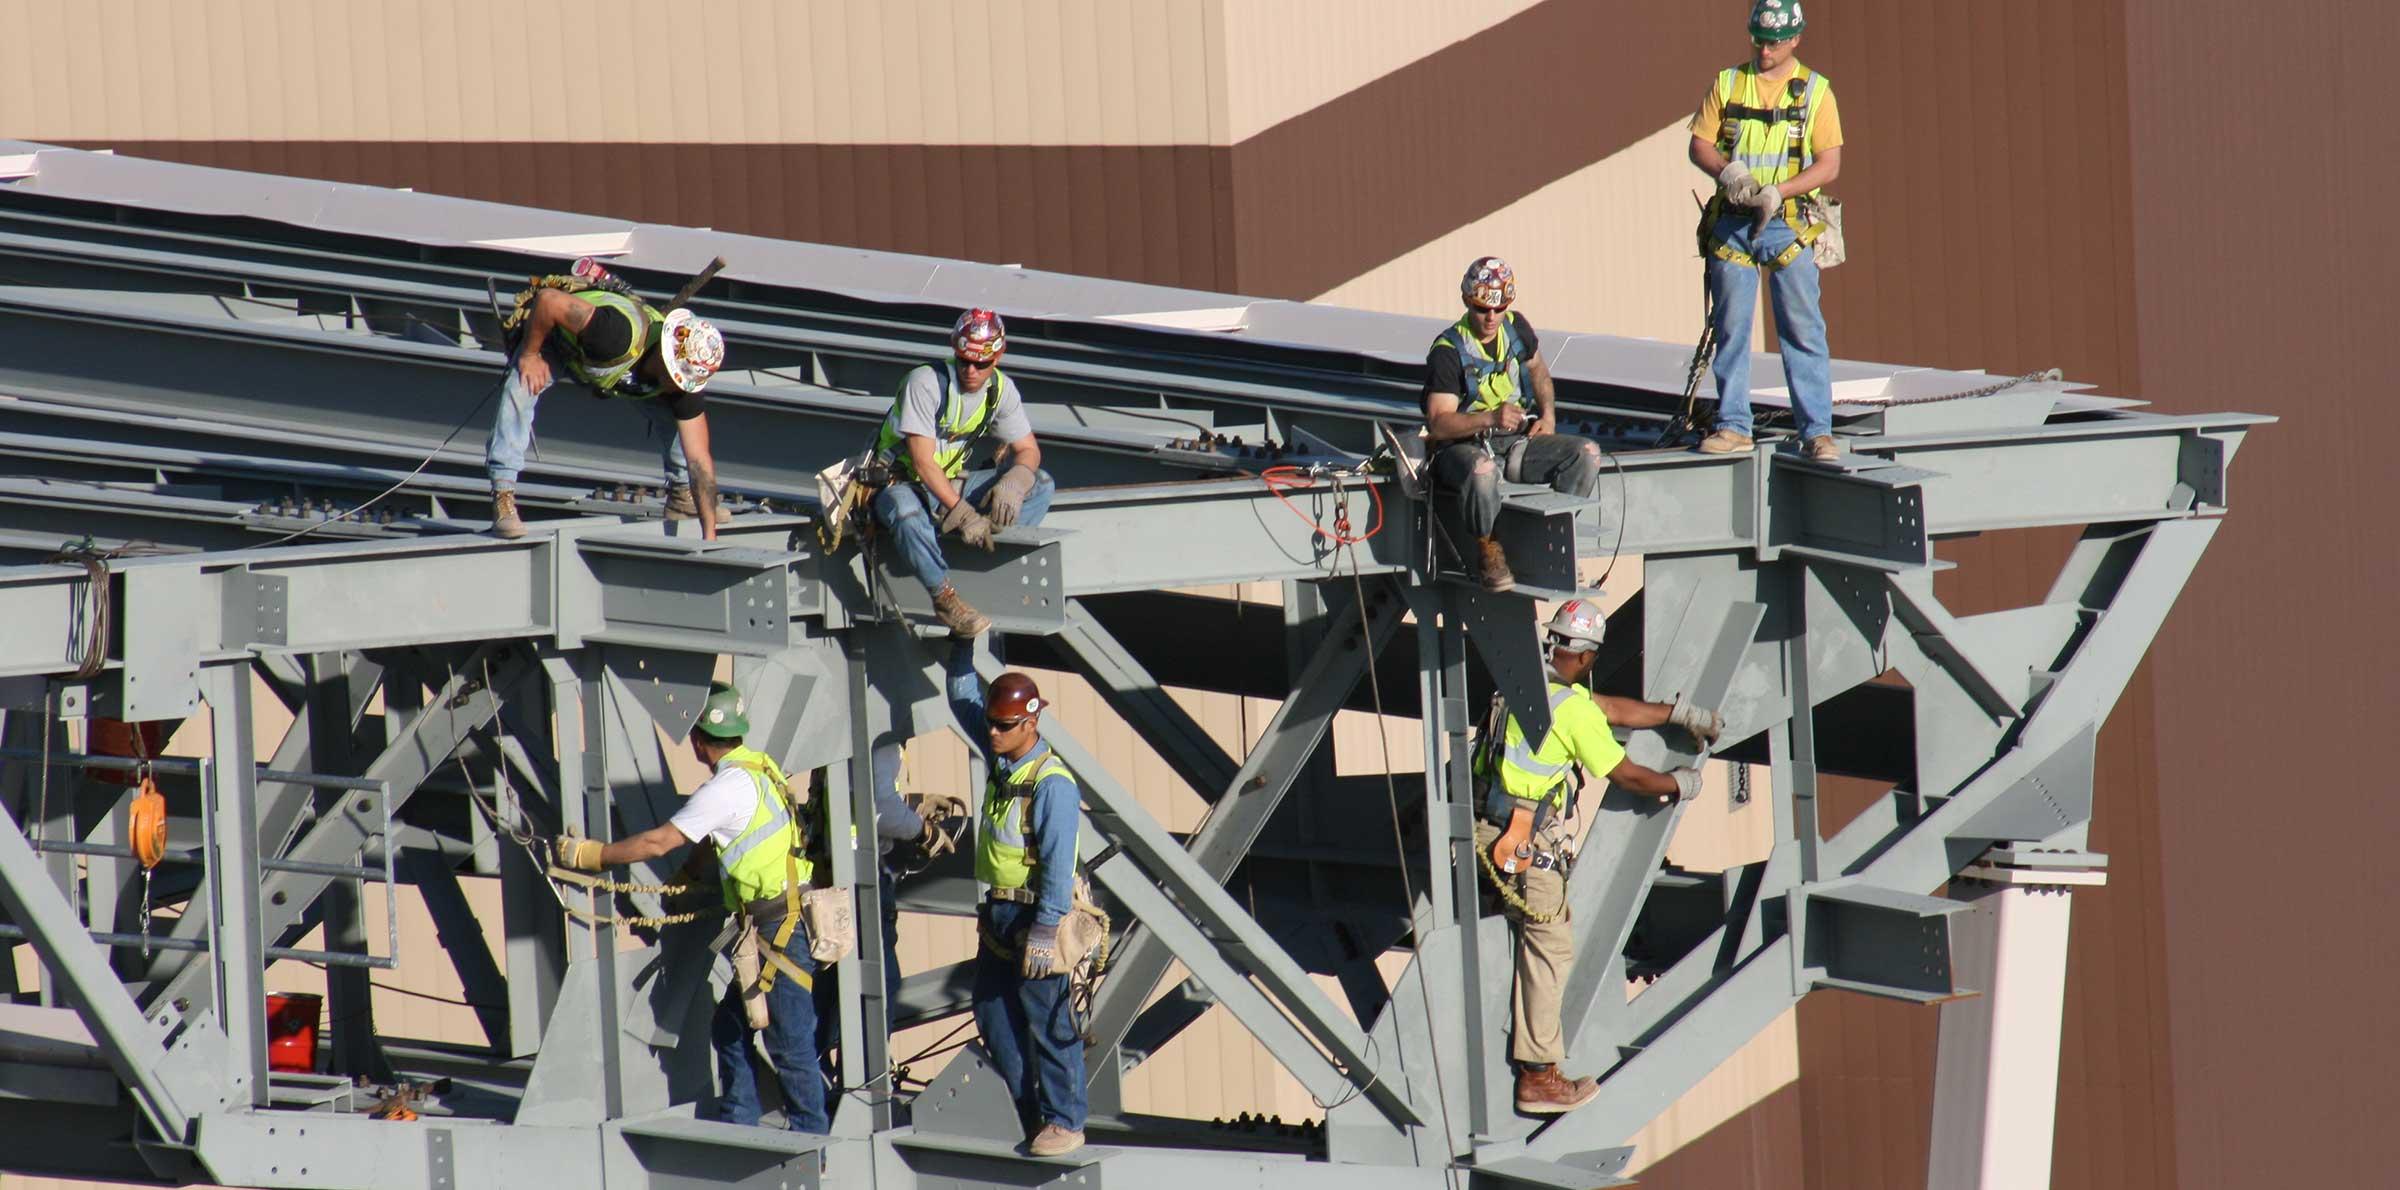 Danny's Construction Company Leadership | Steel Erection